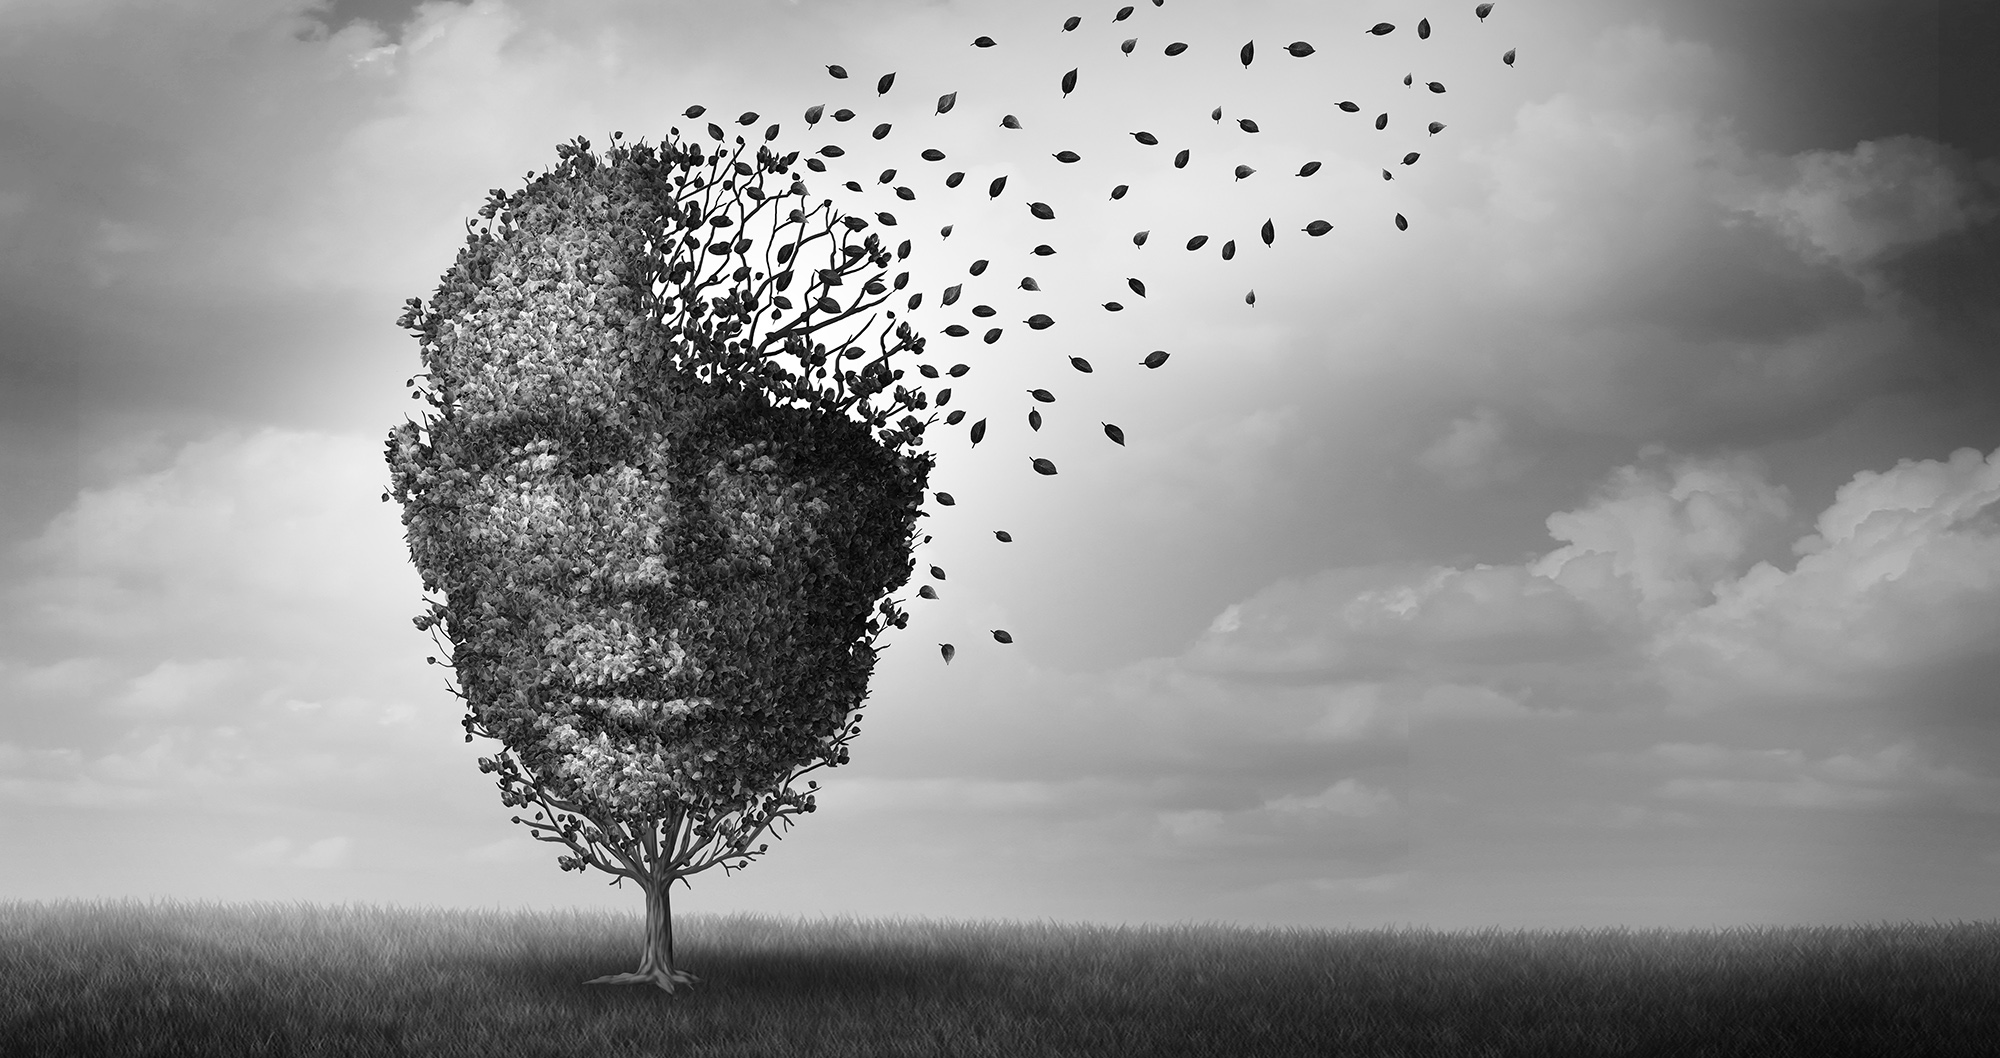 BUSINESS MAVERICK OP-ED: Dementia: Heartbreaking, sad… and also a major financial problem